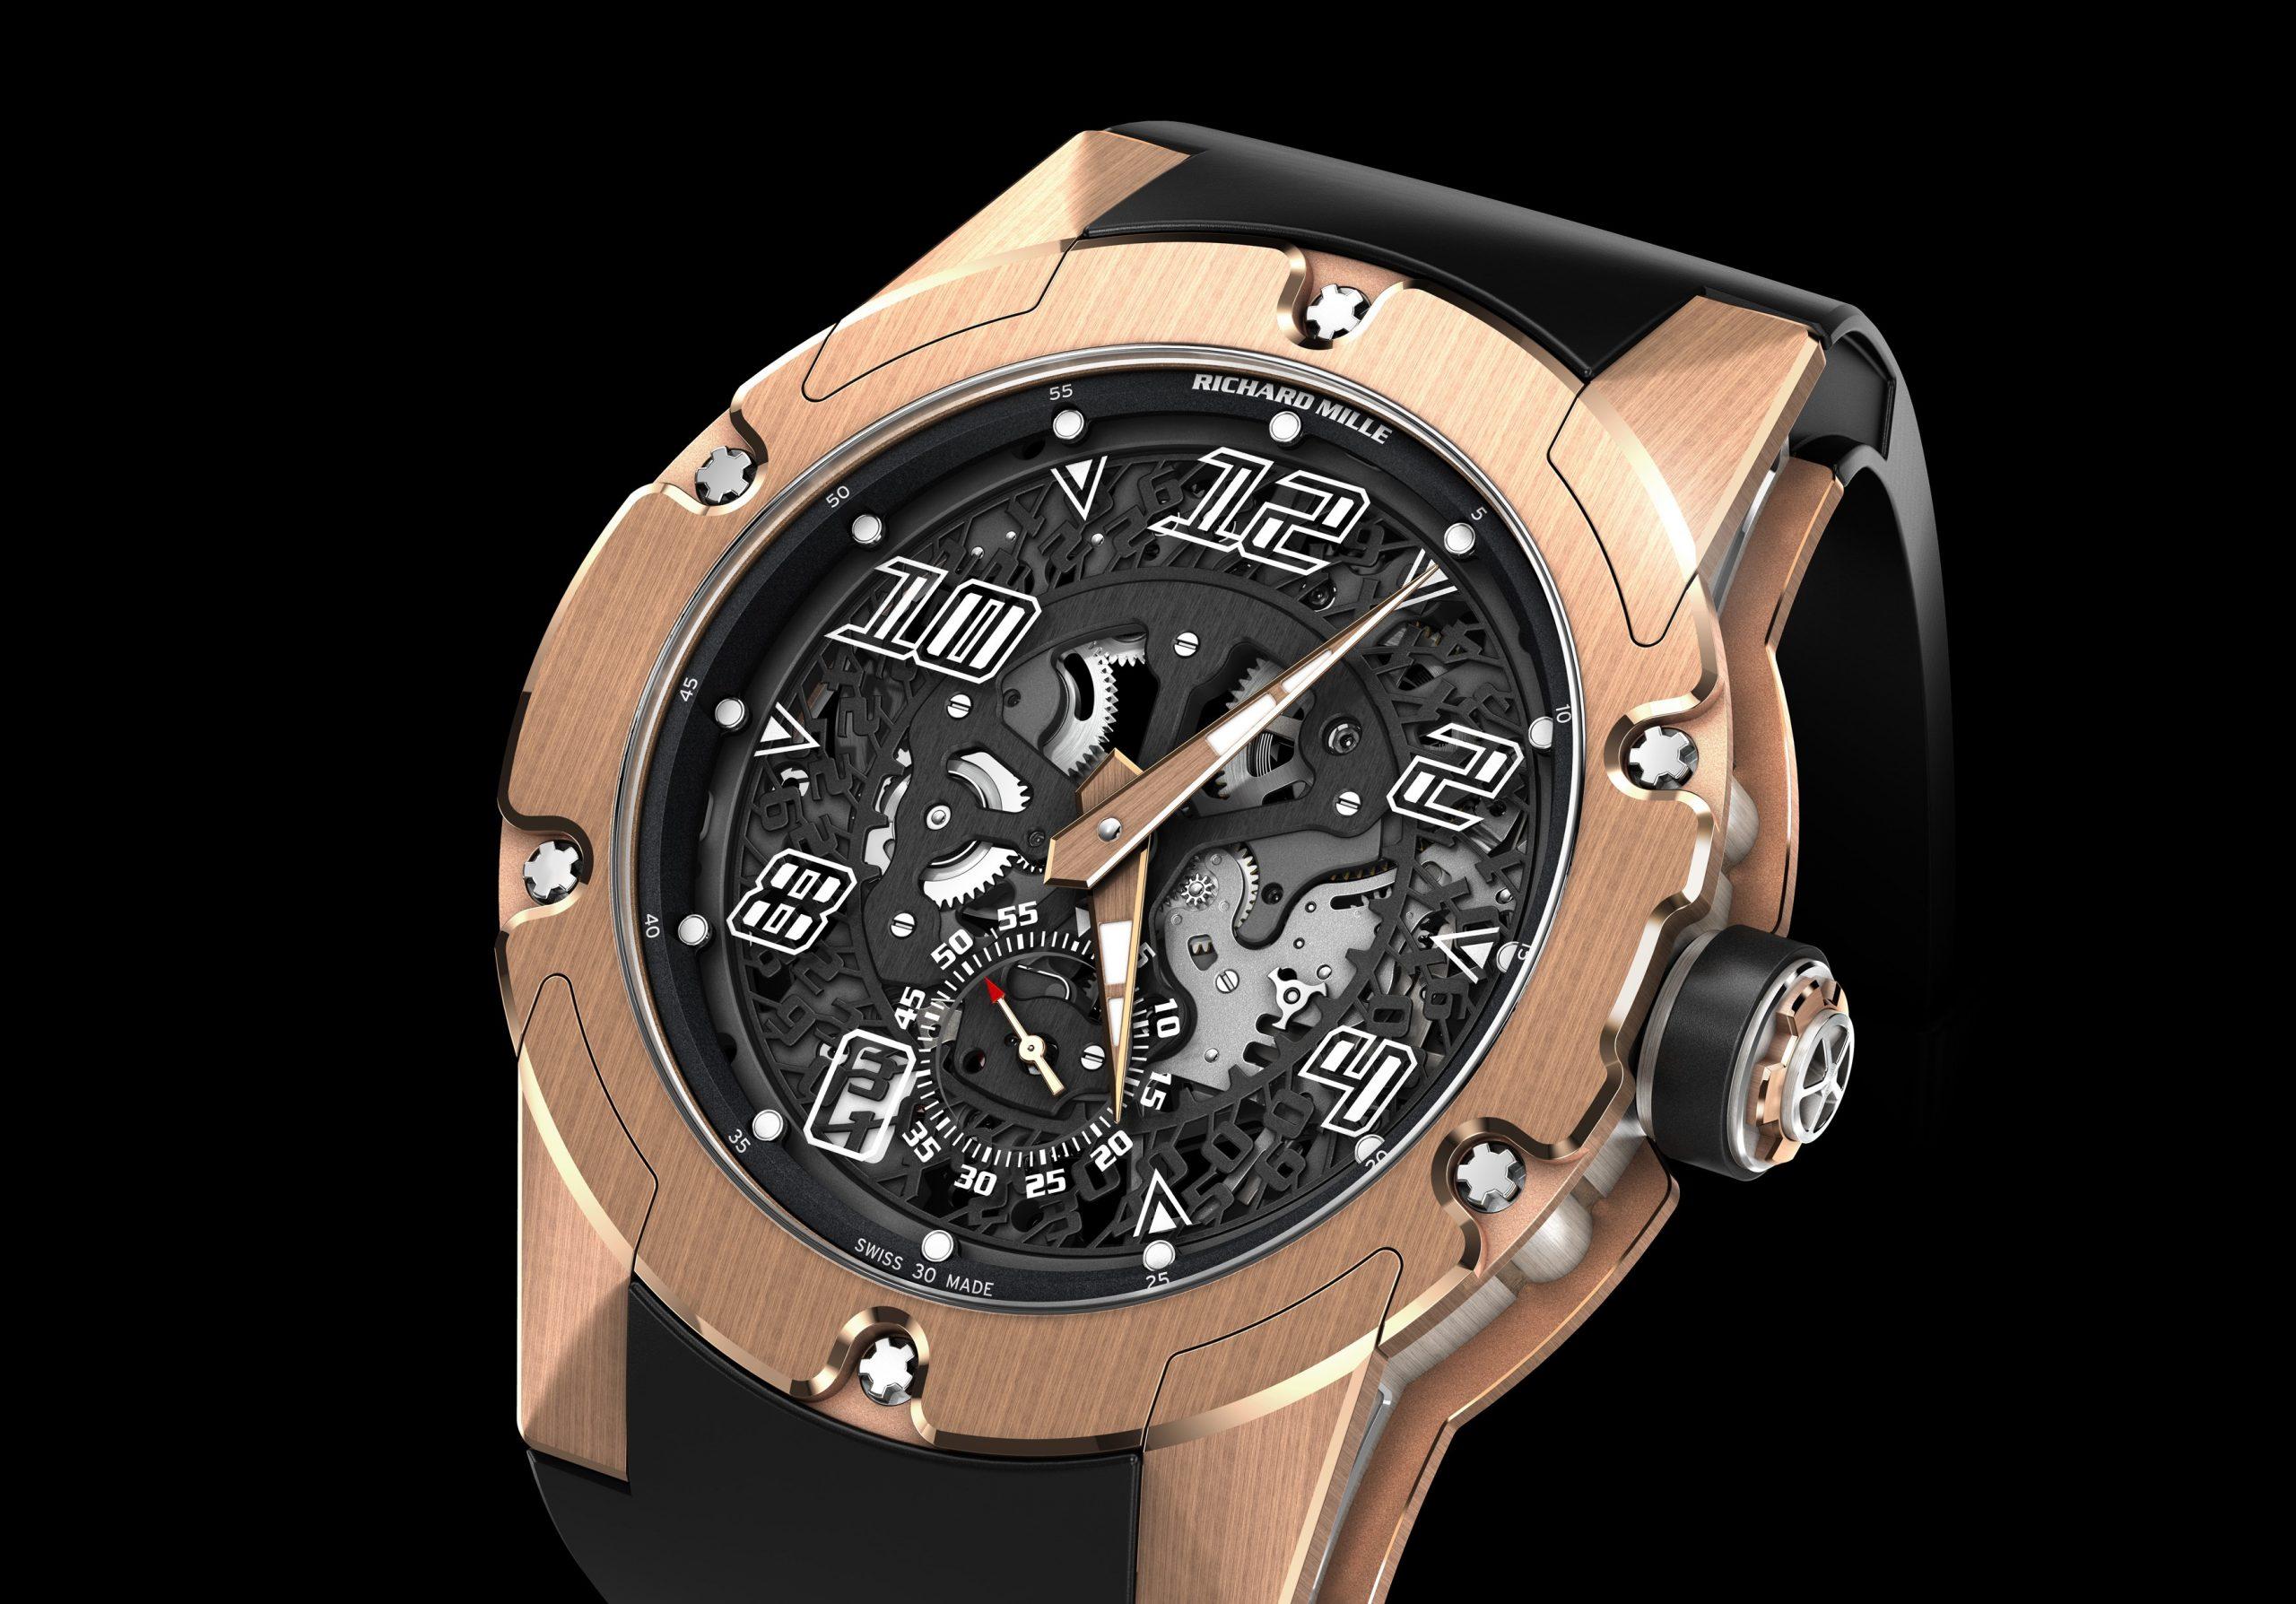 O novo relógio da Richard Mille, o RM33-01